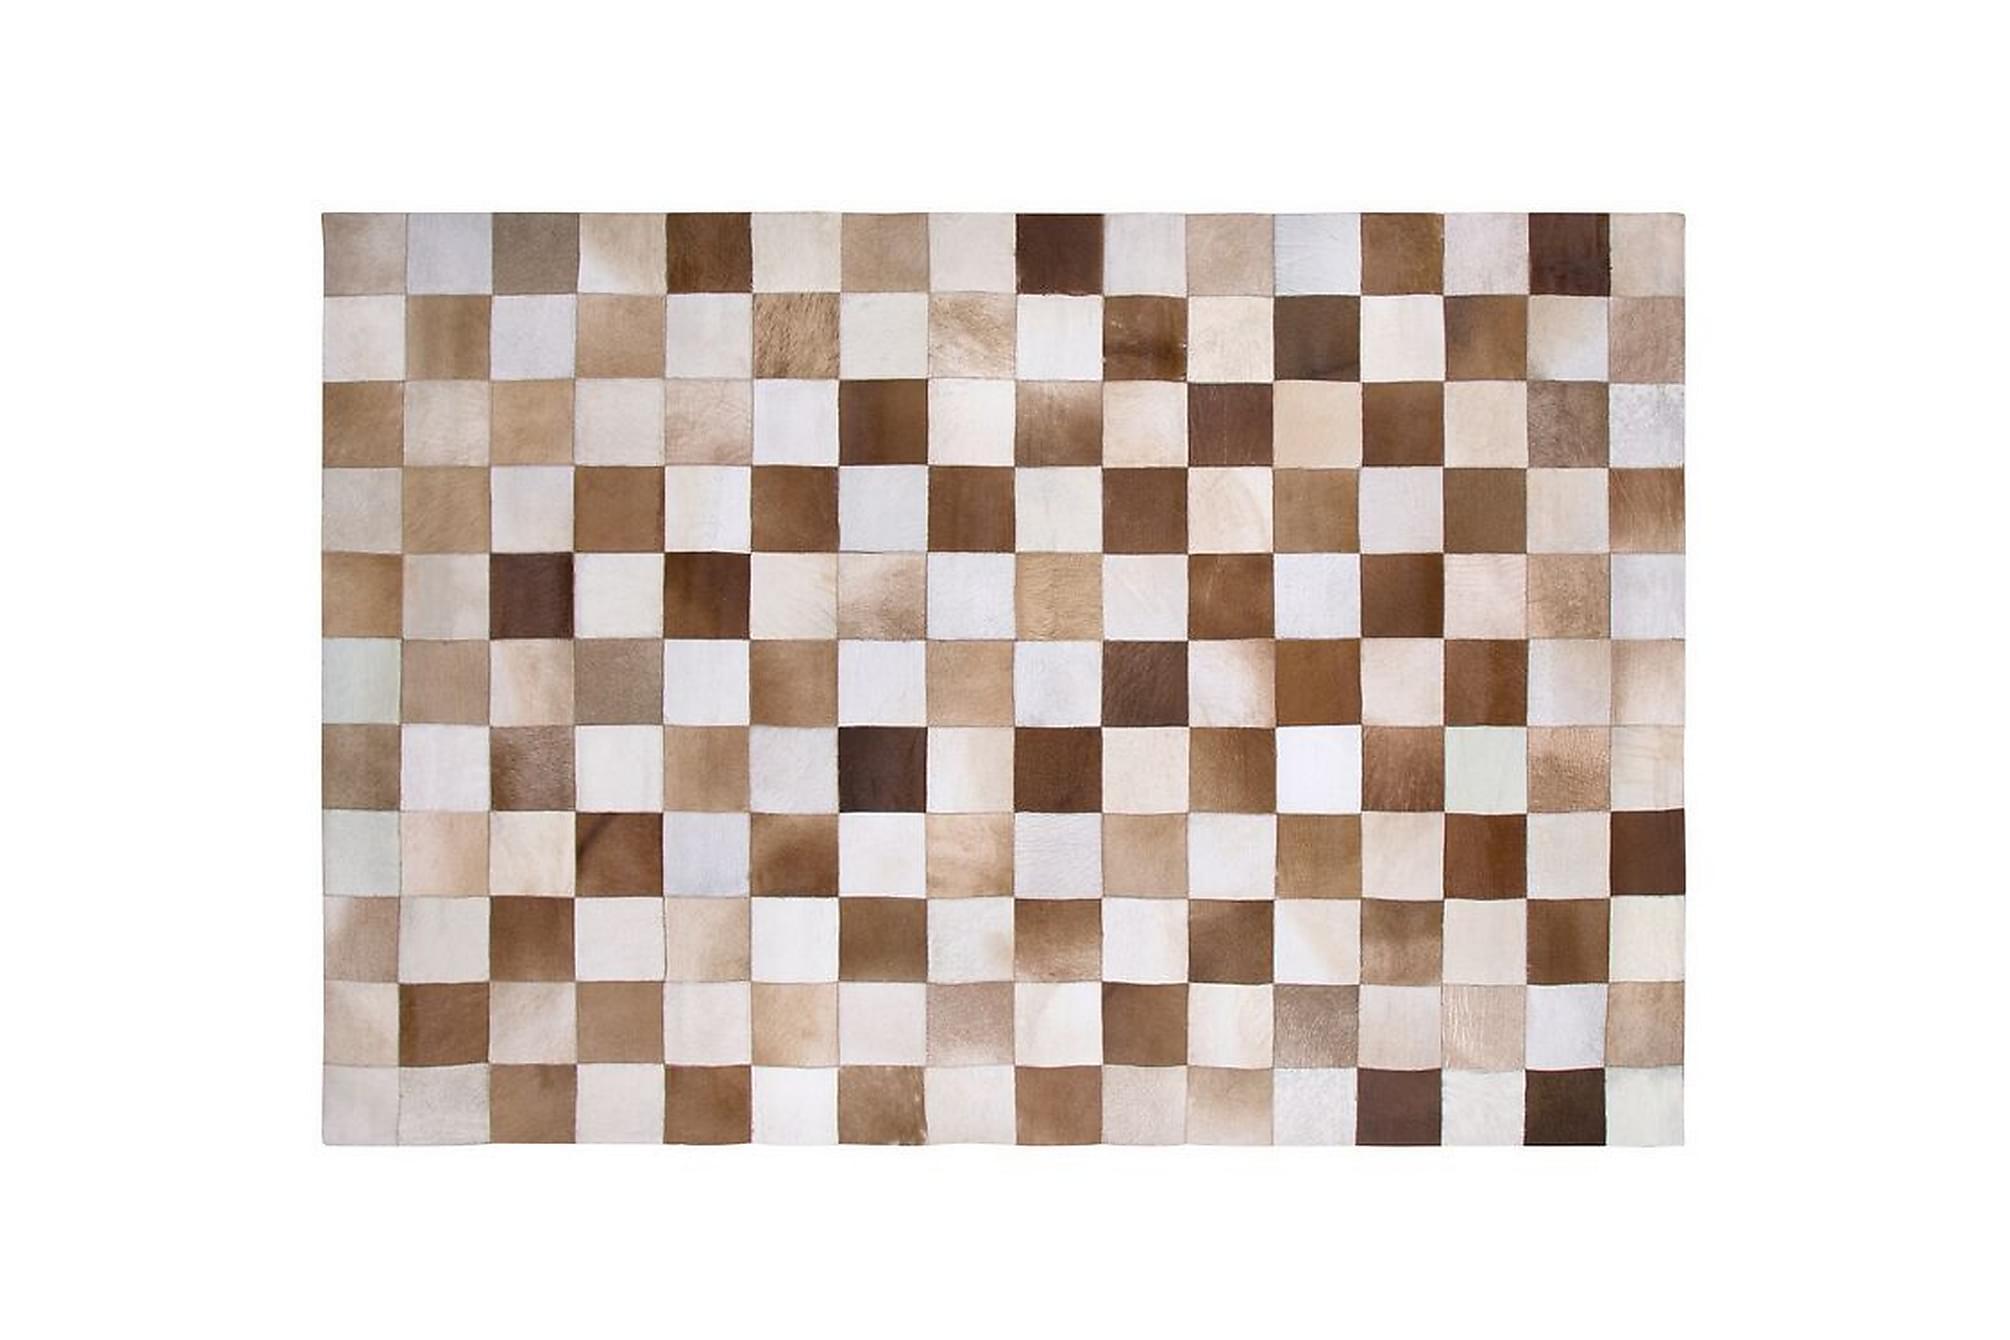 ARYIAH Matta 160x230 cm Läder Brun, Fällar & skinnmattor